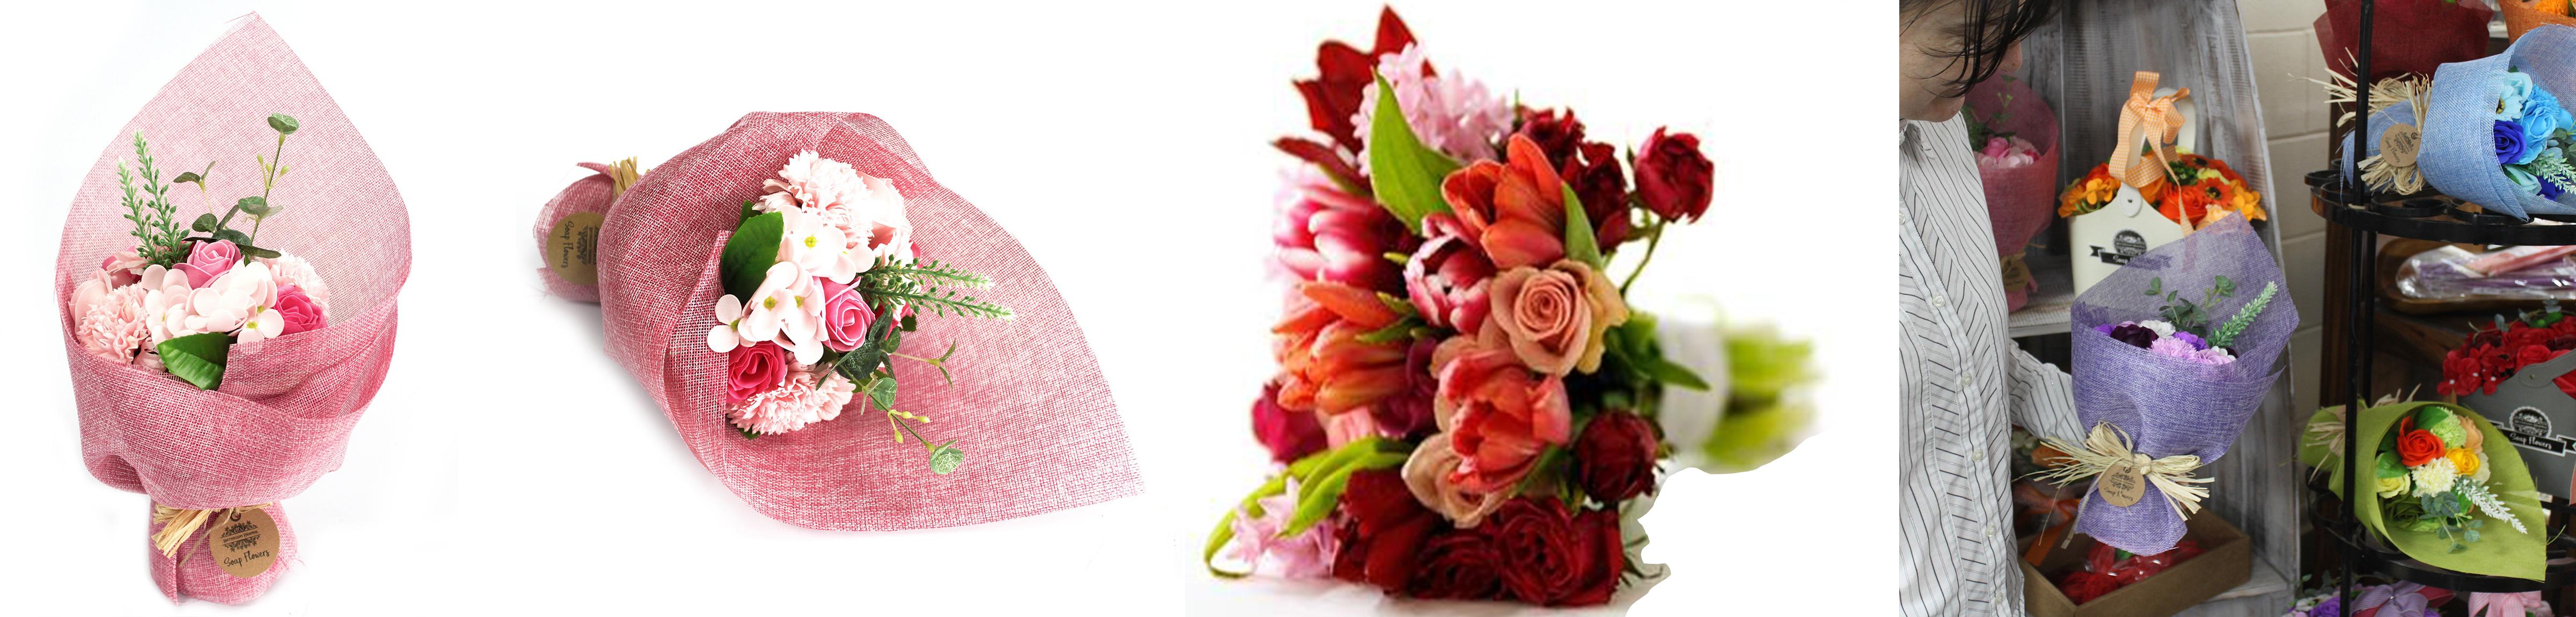 pink-flower-bouquet-top-image-1.jpg